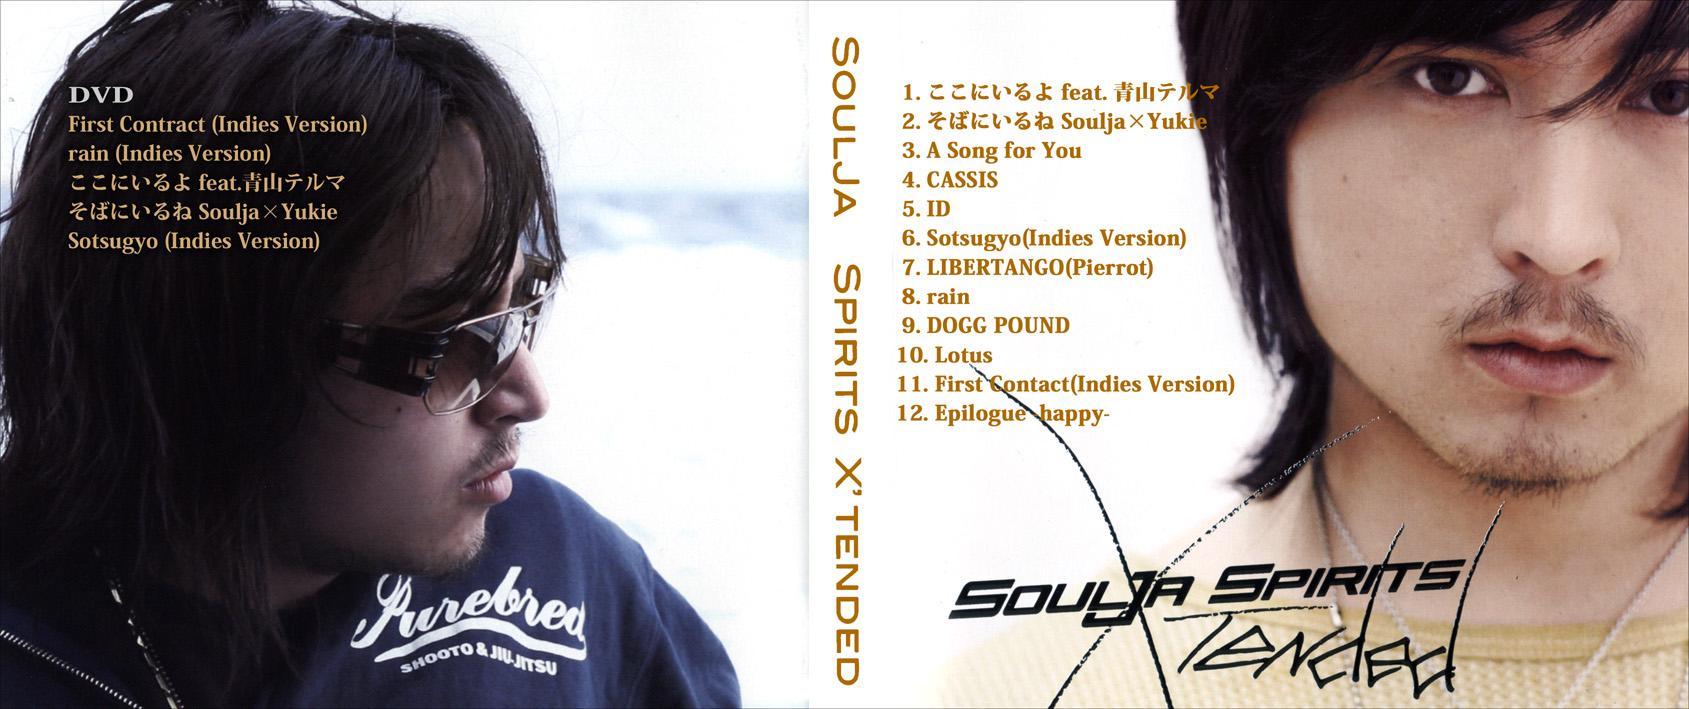 Soulja - Colorz